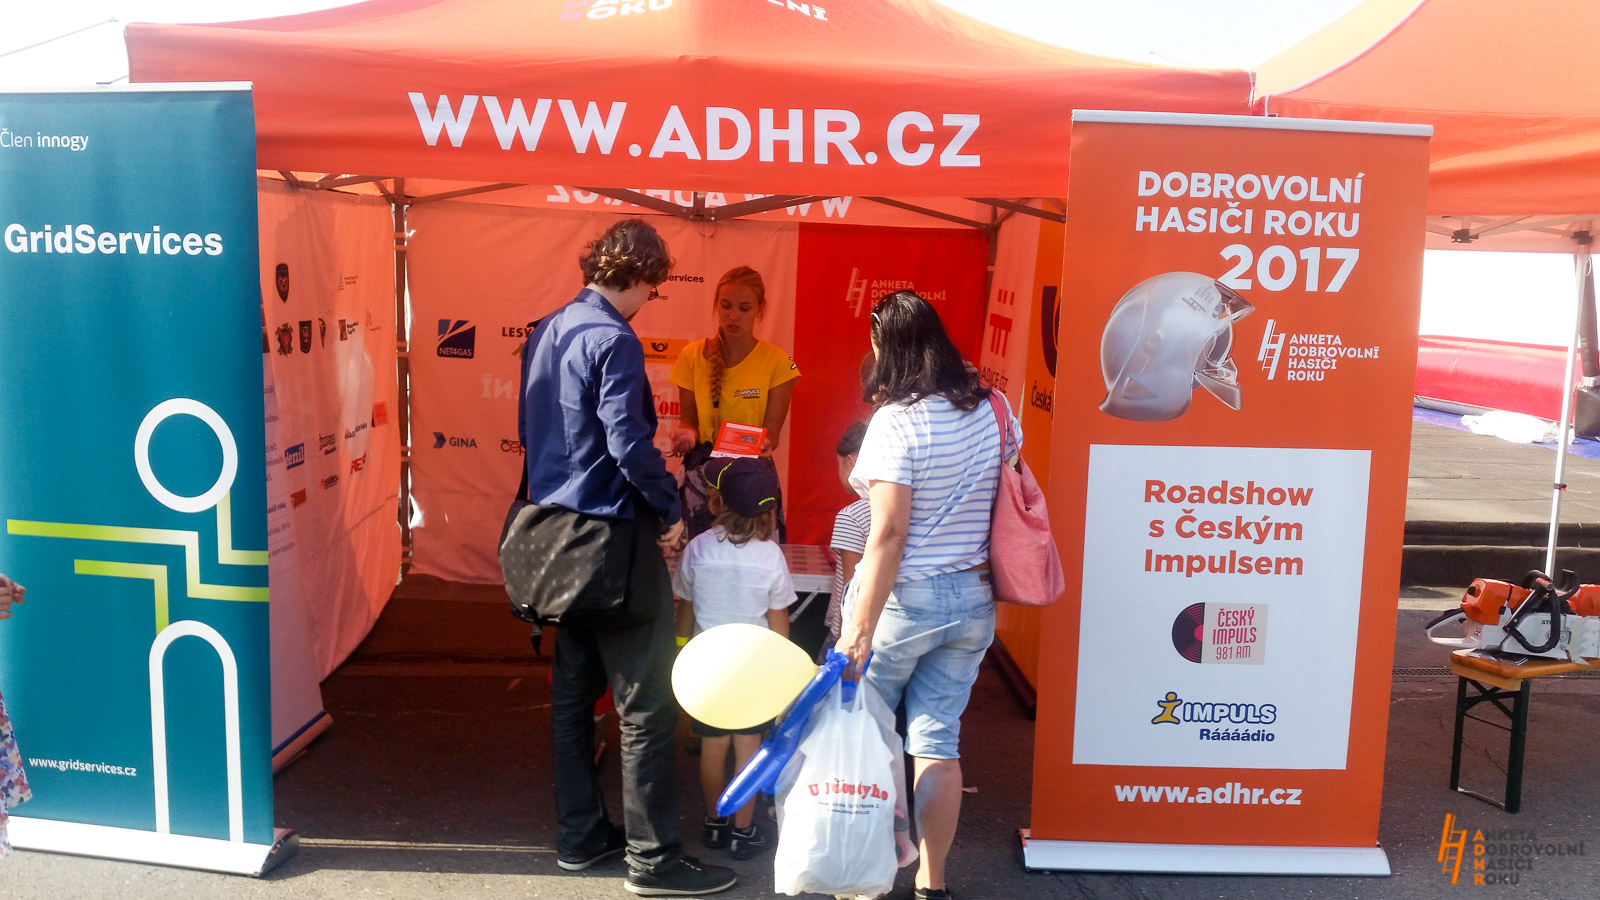 adhr-praha-mistrostvi-cr-pozarni-sport-08-25-2017--37